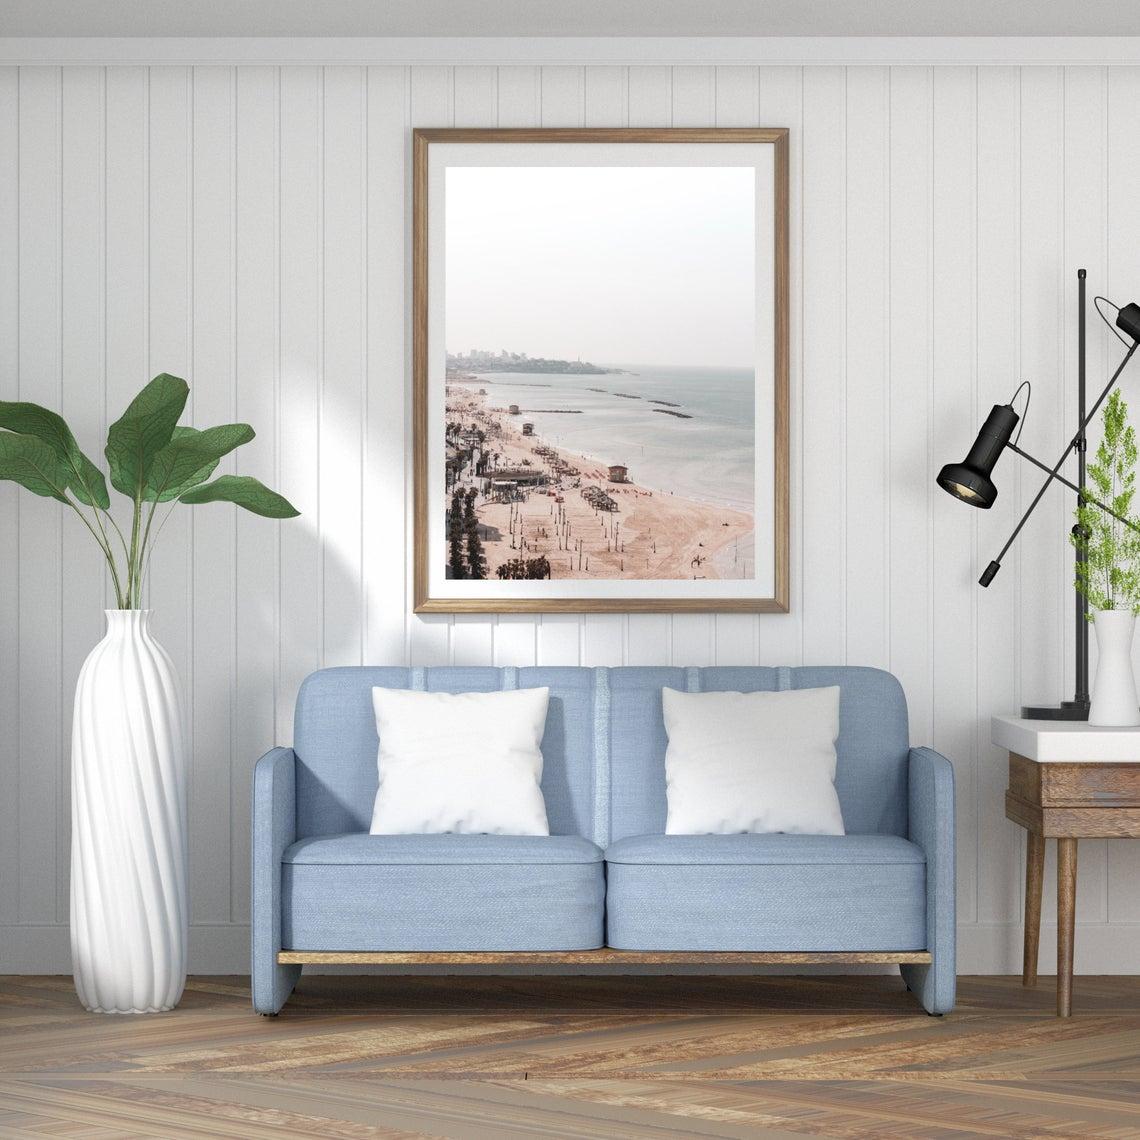 tel aviv beach waterfront wall print